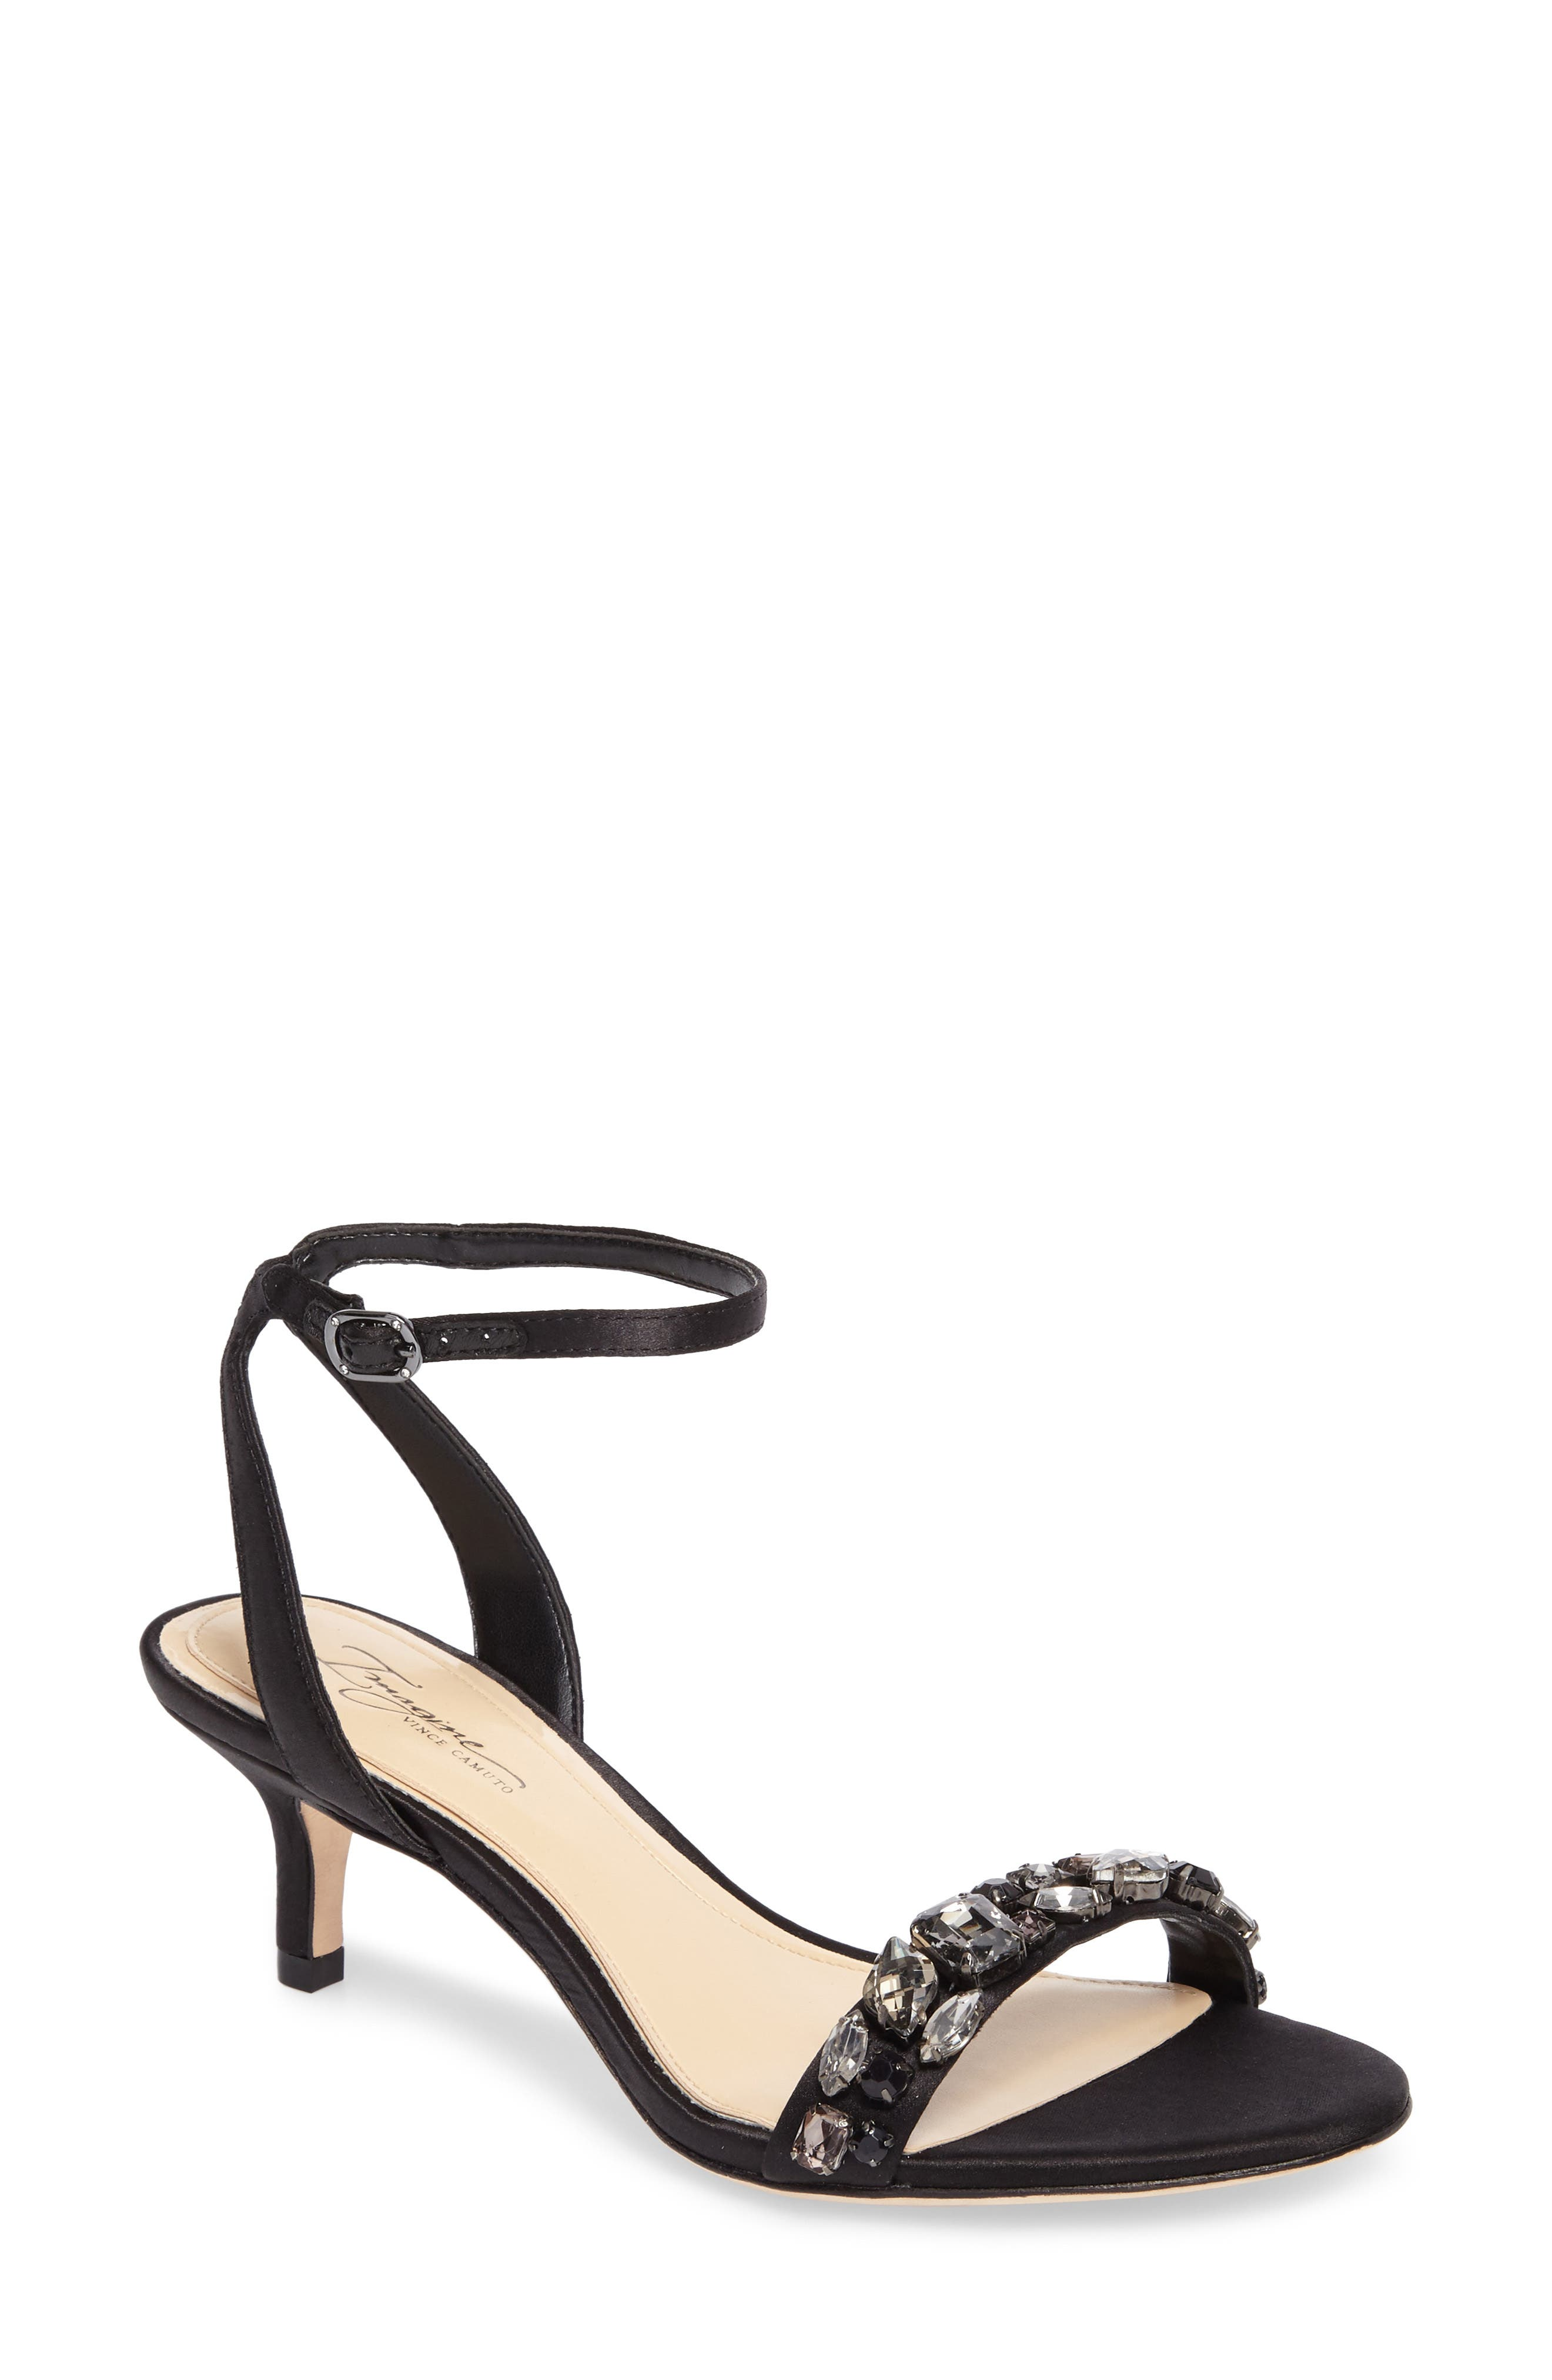 Alternate Image 1 Selected - Imagine Vince Camuto Kolo Embellished Kitten Heel Sandal (Women)